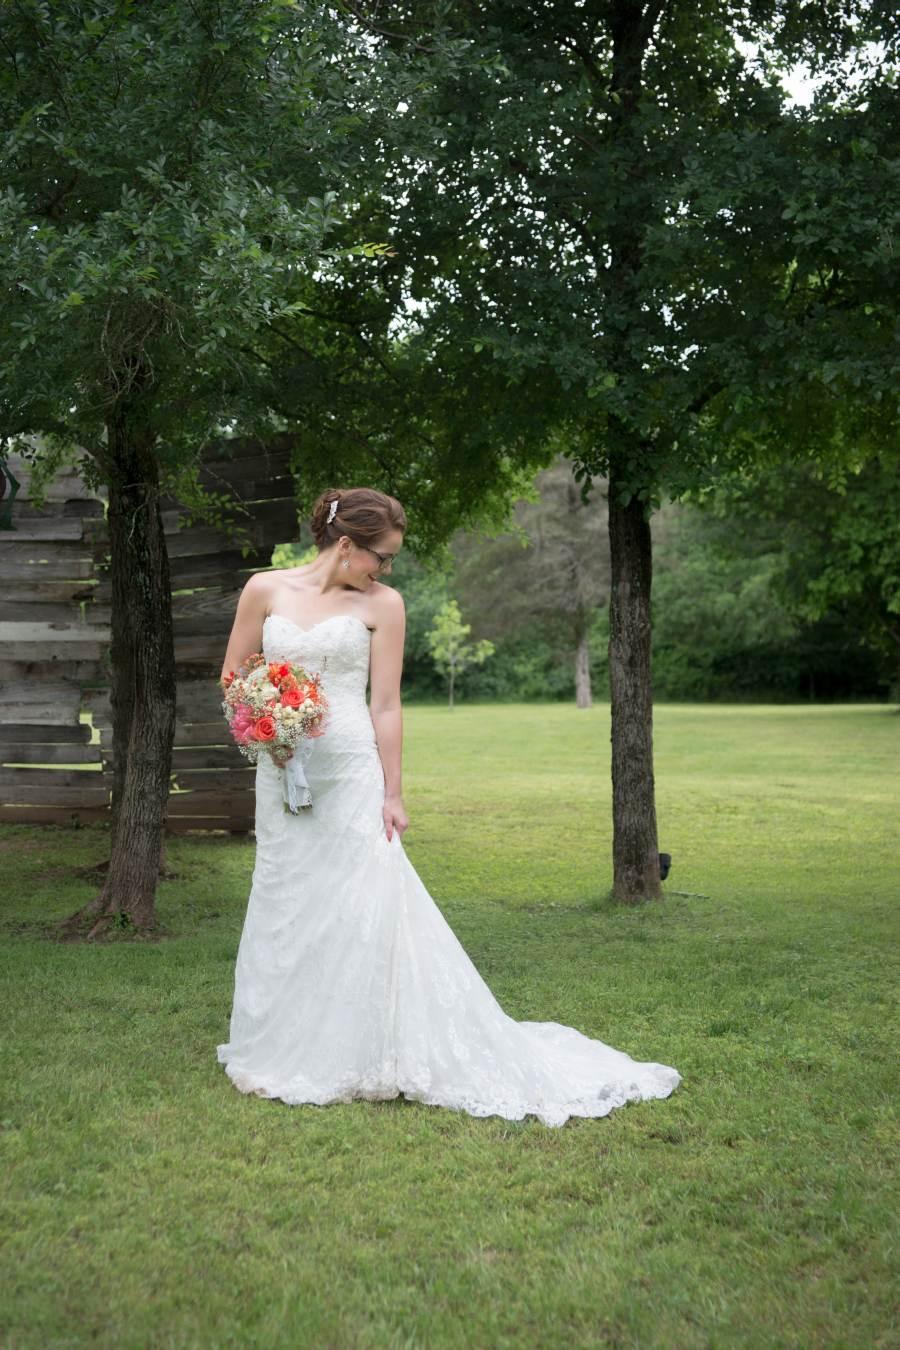 HighDot-Studios-Wedding-Cedar-Bend-Event-Center -Austin-Kim and Mike (35)